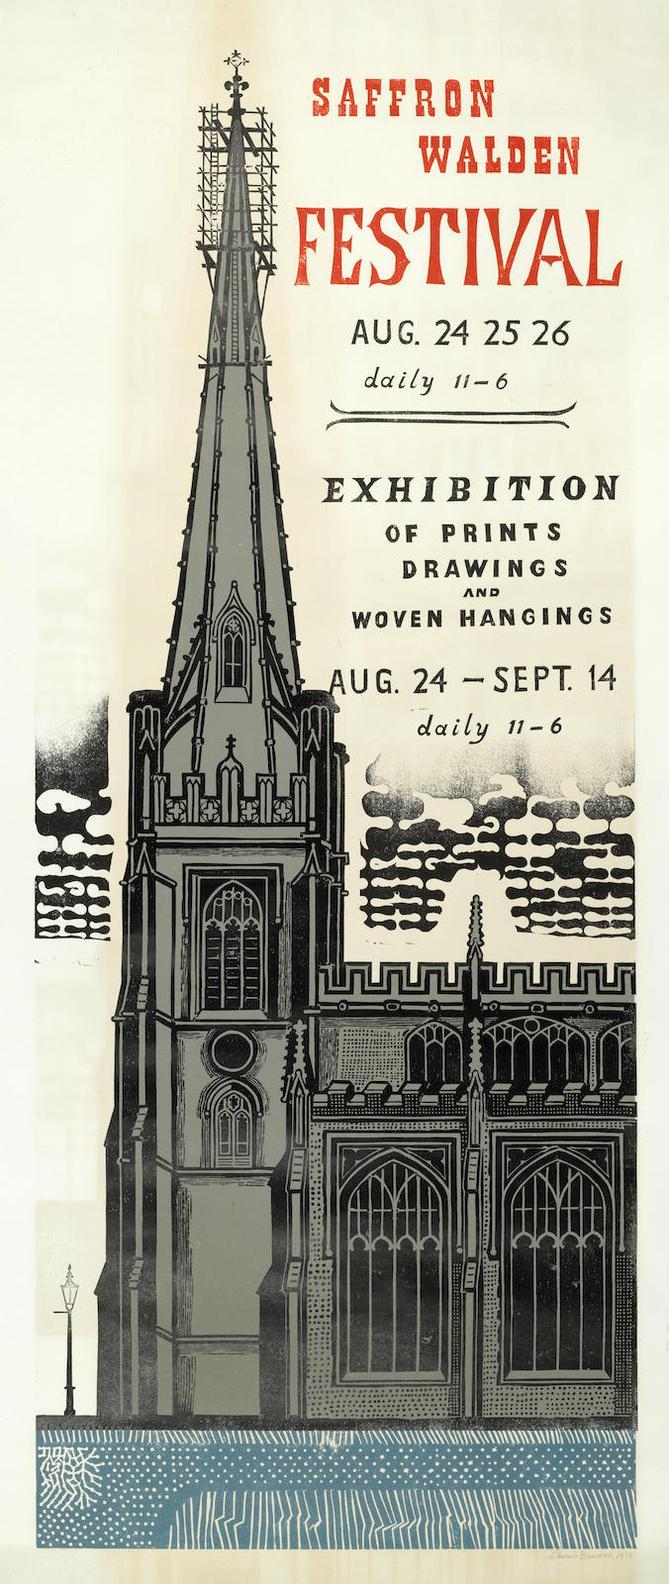 Edward Bawden-Saffron Walden Festival Poster-1975